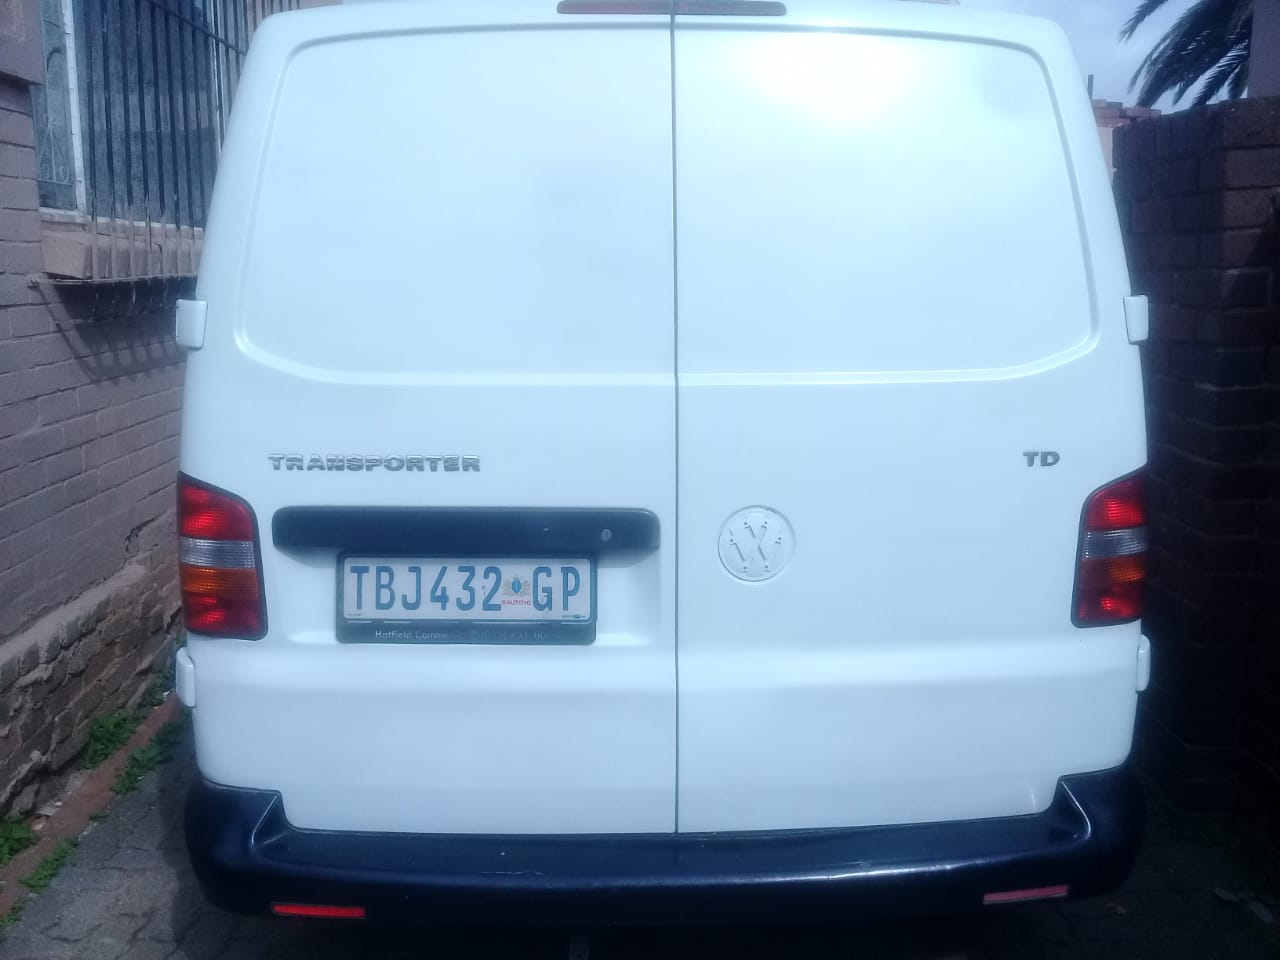 2006 VW Transporter 1.9TDI crew bus SWB